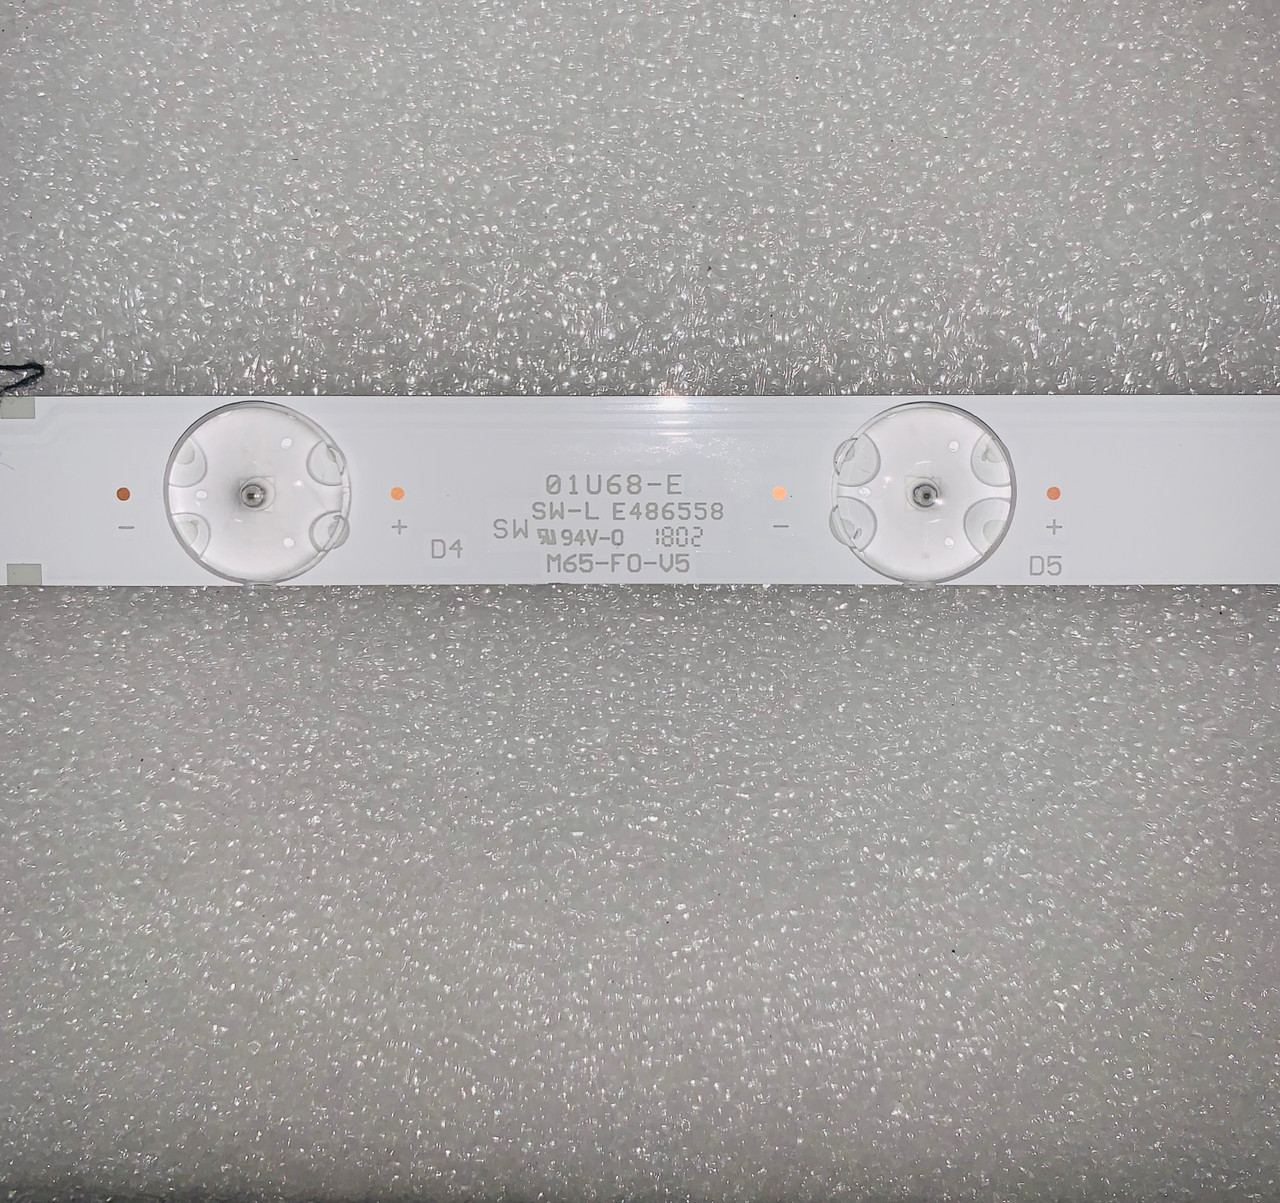 Vizio M65-F0 LED Light Strips set of 20 M65-F0-V5